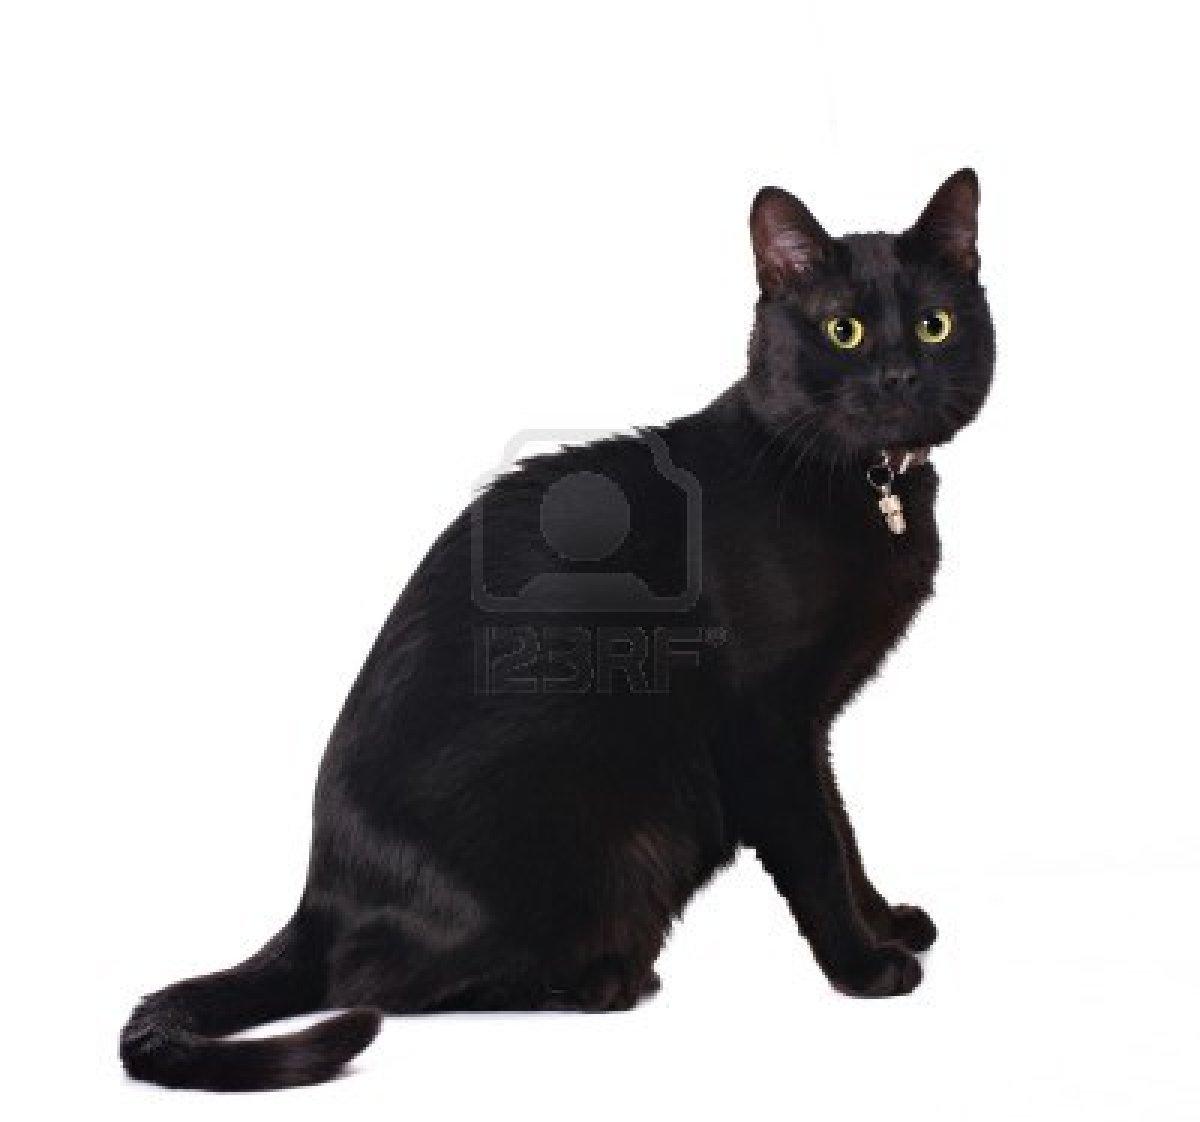 Free Download Art Hd Black Cat Clipart Wallpaper Beautiful Cats Wallpaper Pictures 1200x1122 For Your Desktop Mobile Tablet Explore 48 Black Cat Wallpaper Drawings Cats Wallpaper Cat Wallpaper 1920x1080